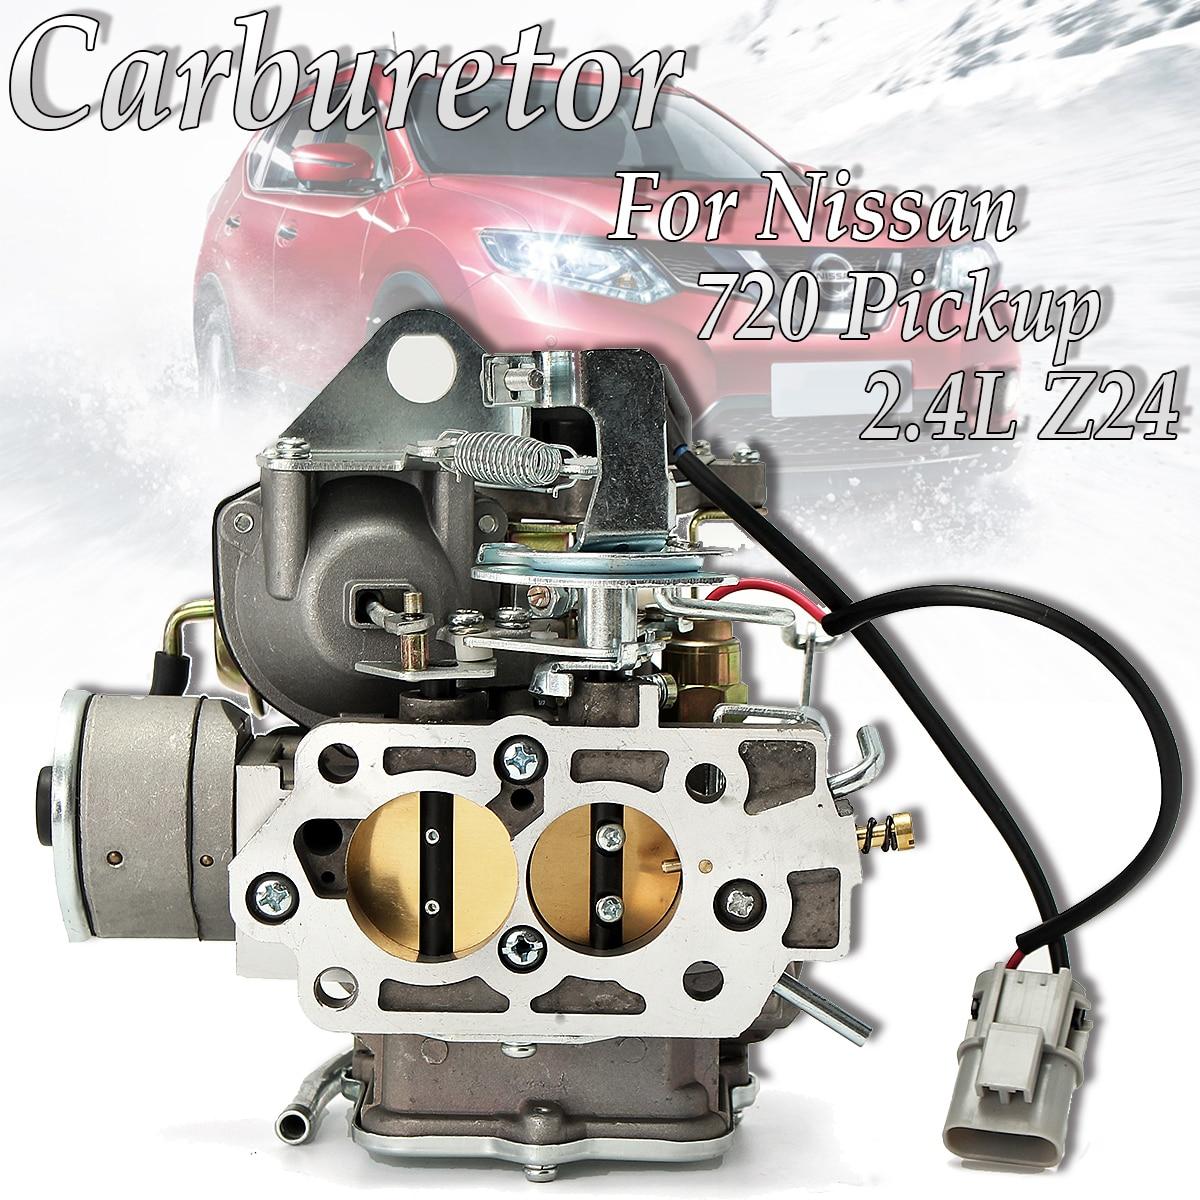 Car Carburetor Carb Engine Assembly Replacement Parts Auto Carburetor for Nissan 720 pickup 2.4L Z24 engine 1983-1986 carburetor carb for nissan a12 cherry pulsar vanette truck datsun sunny b210 pulsar truck 16010 h1602 16010h1602 16010 h1602